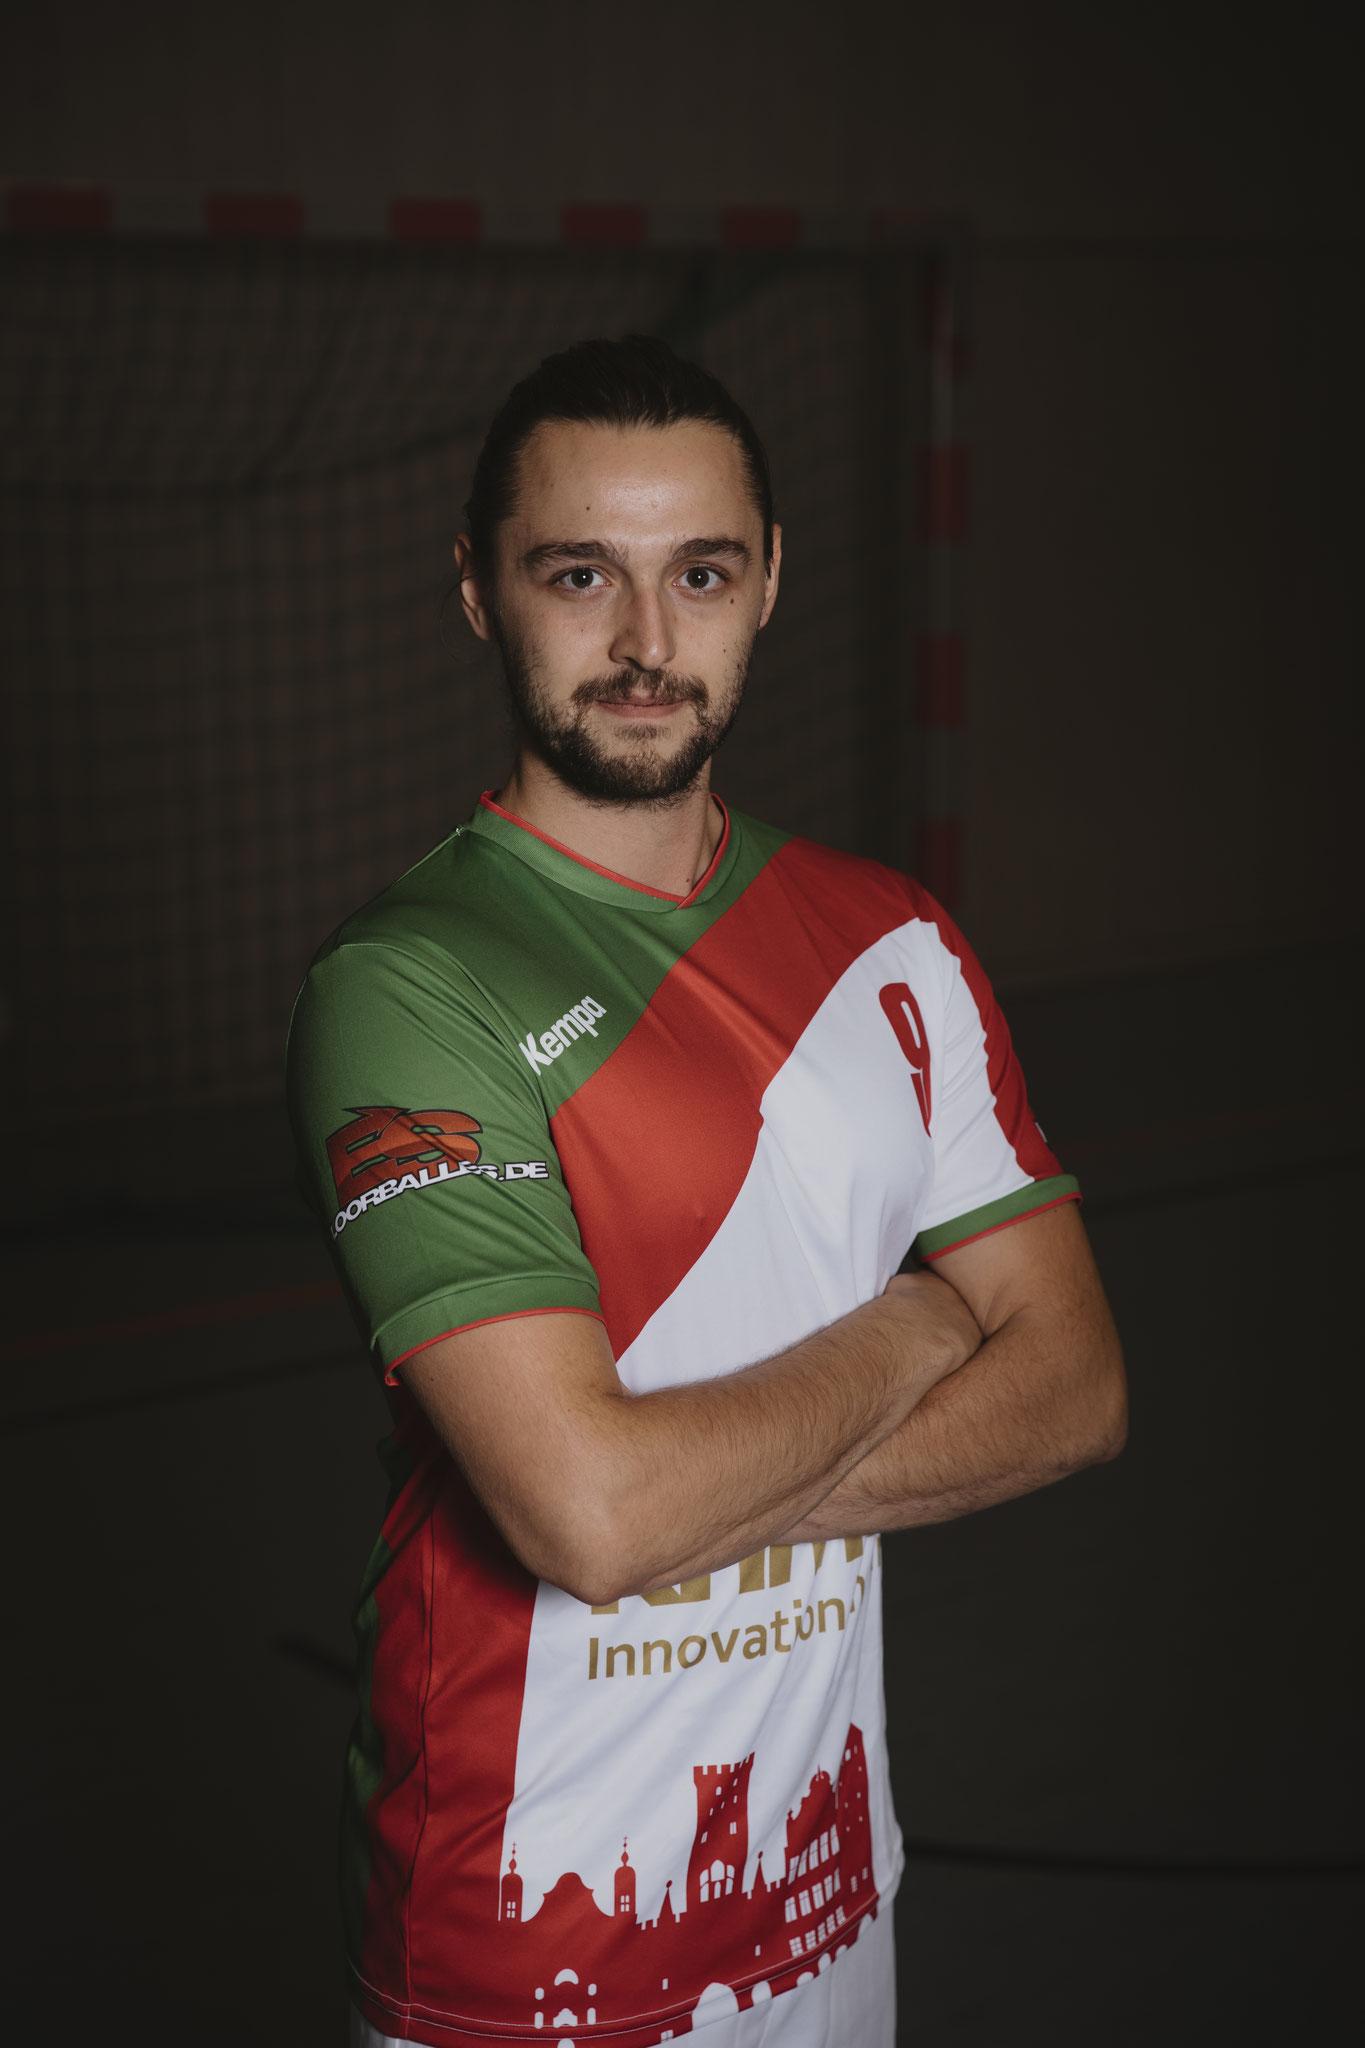 Florian Horky